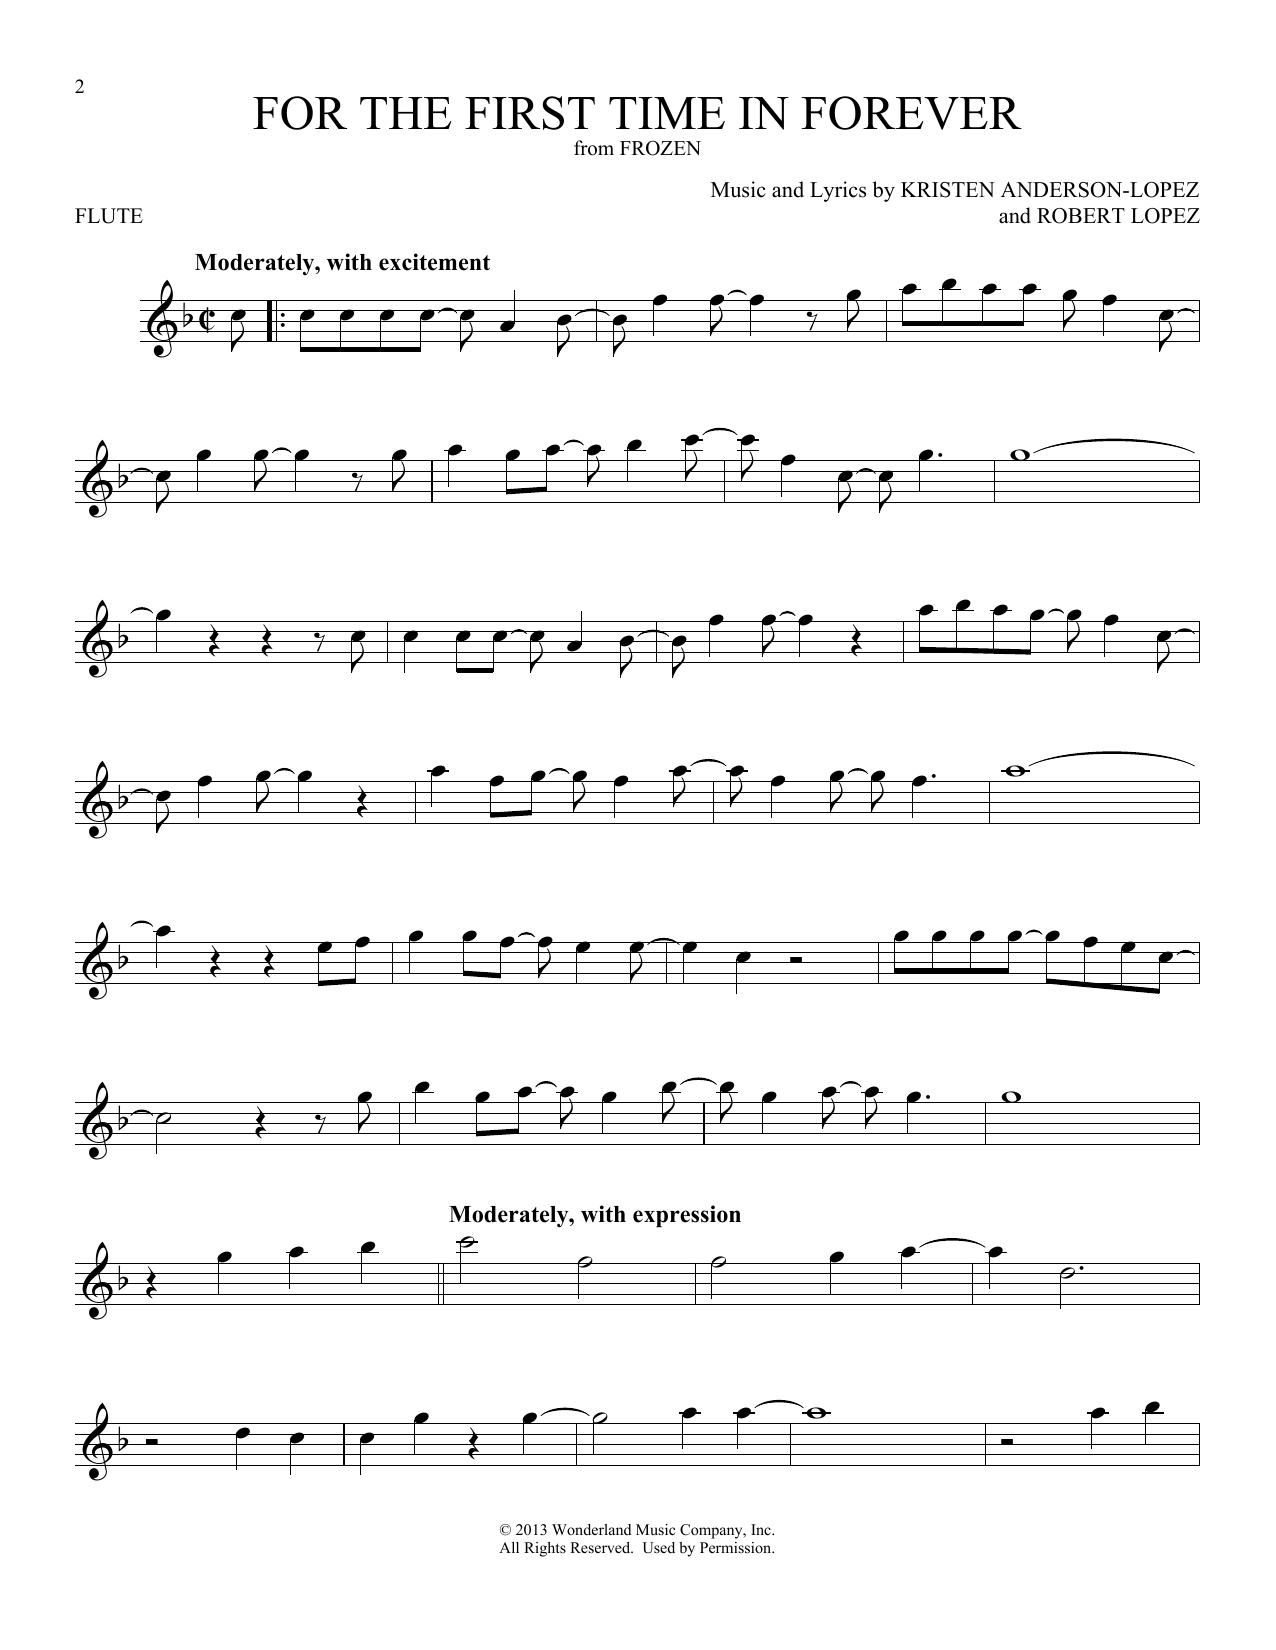 sheet music digital files